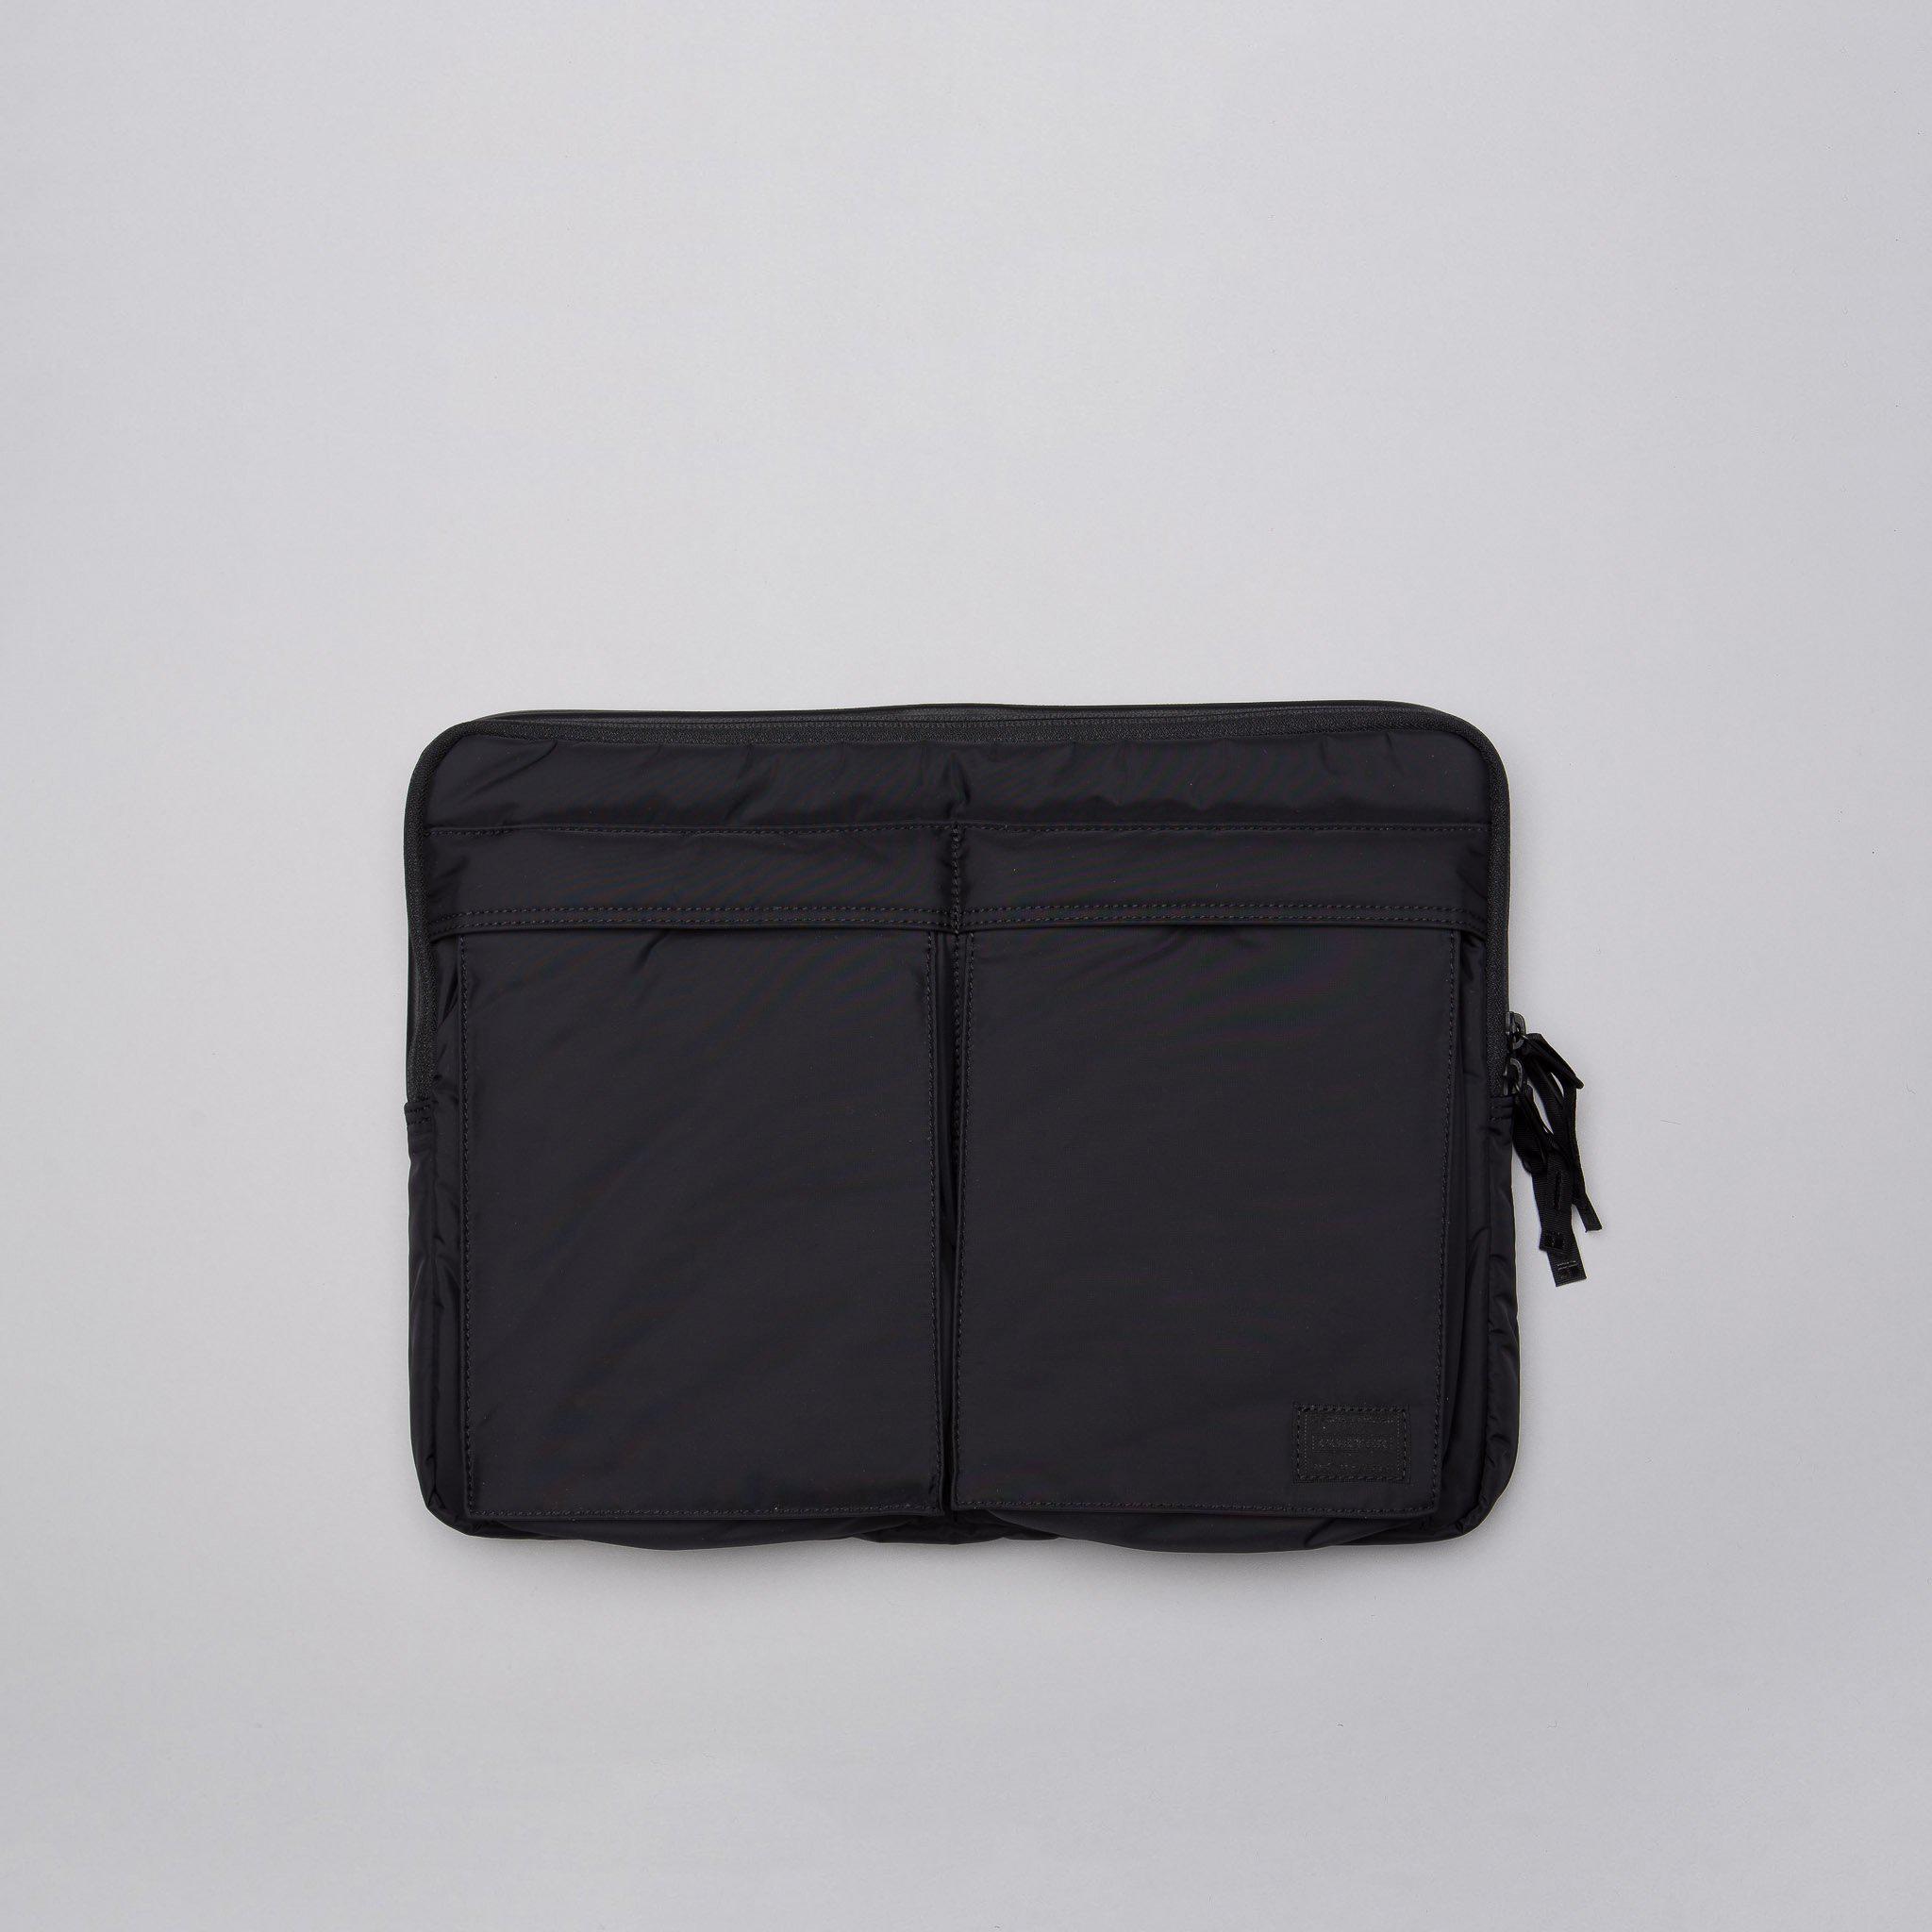 Lyst - Head Porter Black Beauty Business Document Bag In Black in ... 23b55a711a750